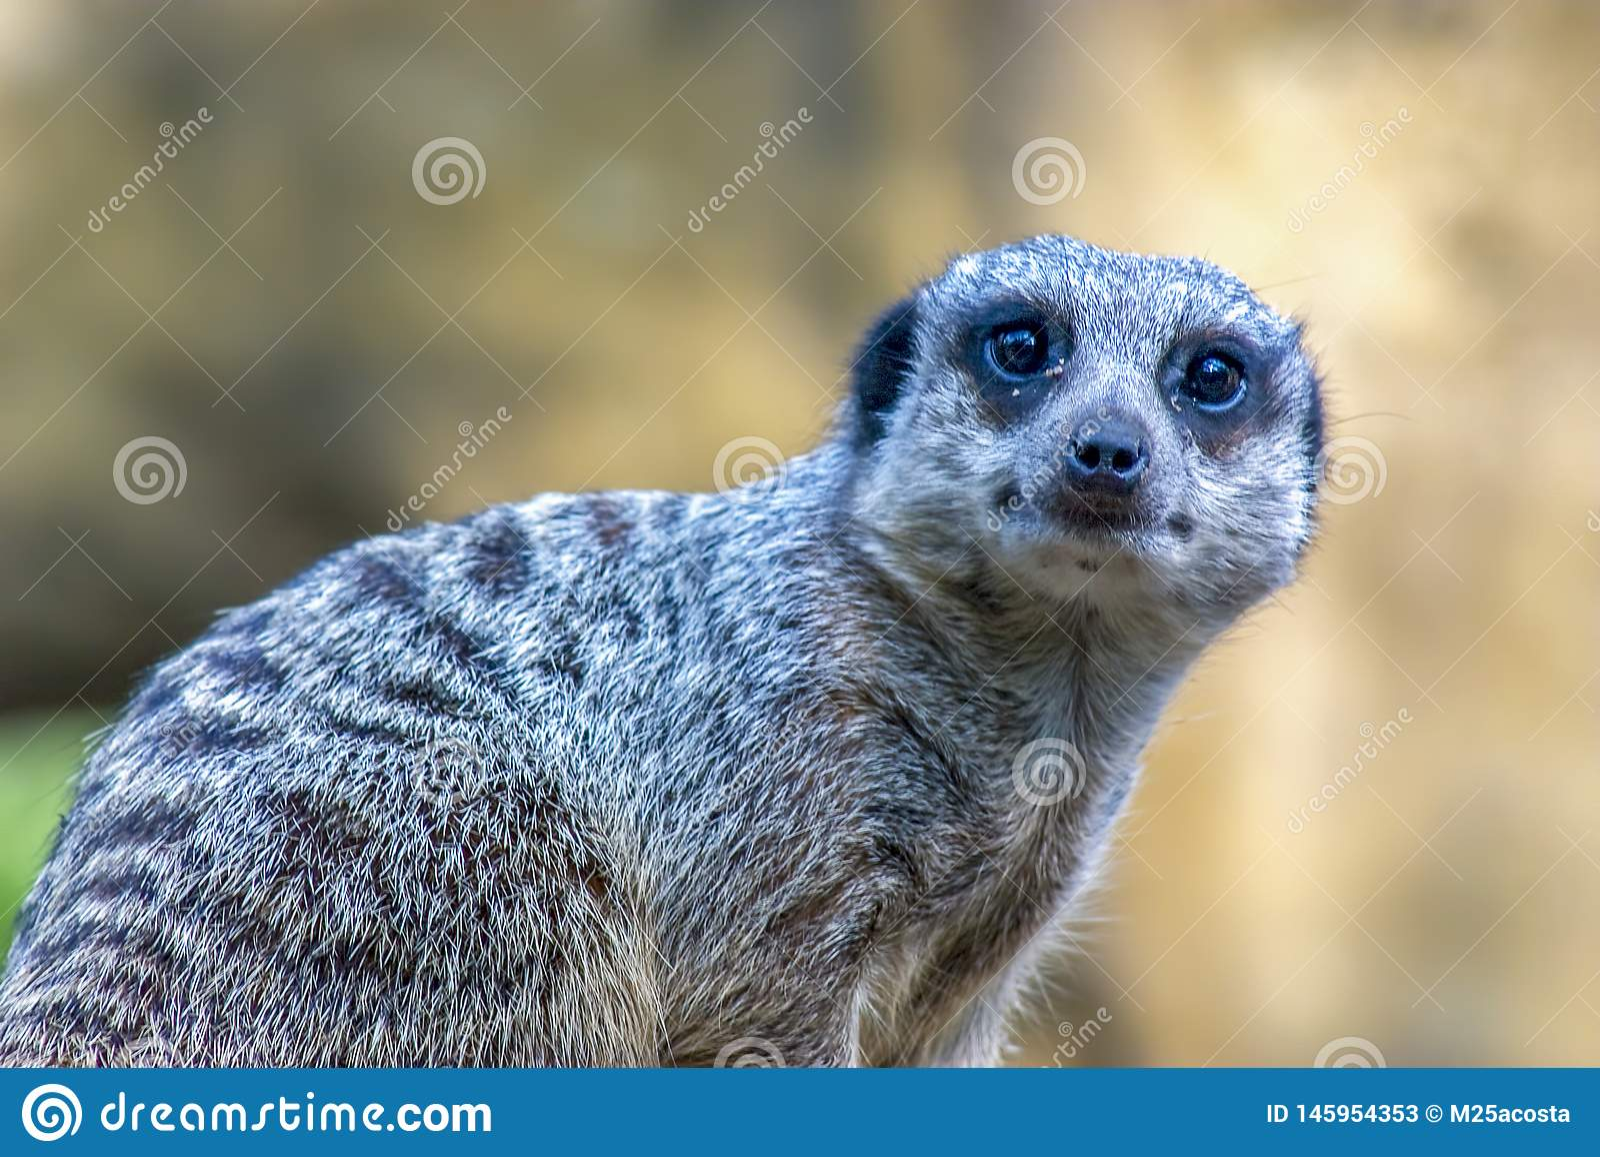 Retrato de um meerkat que olha curioso